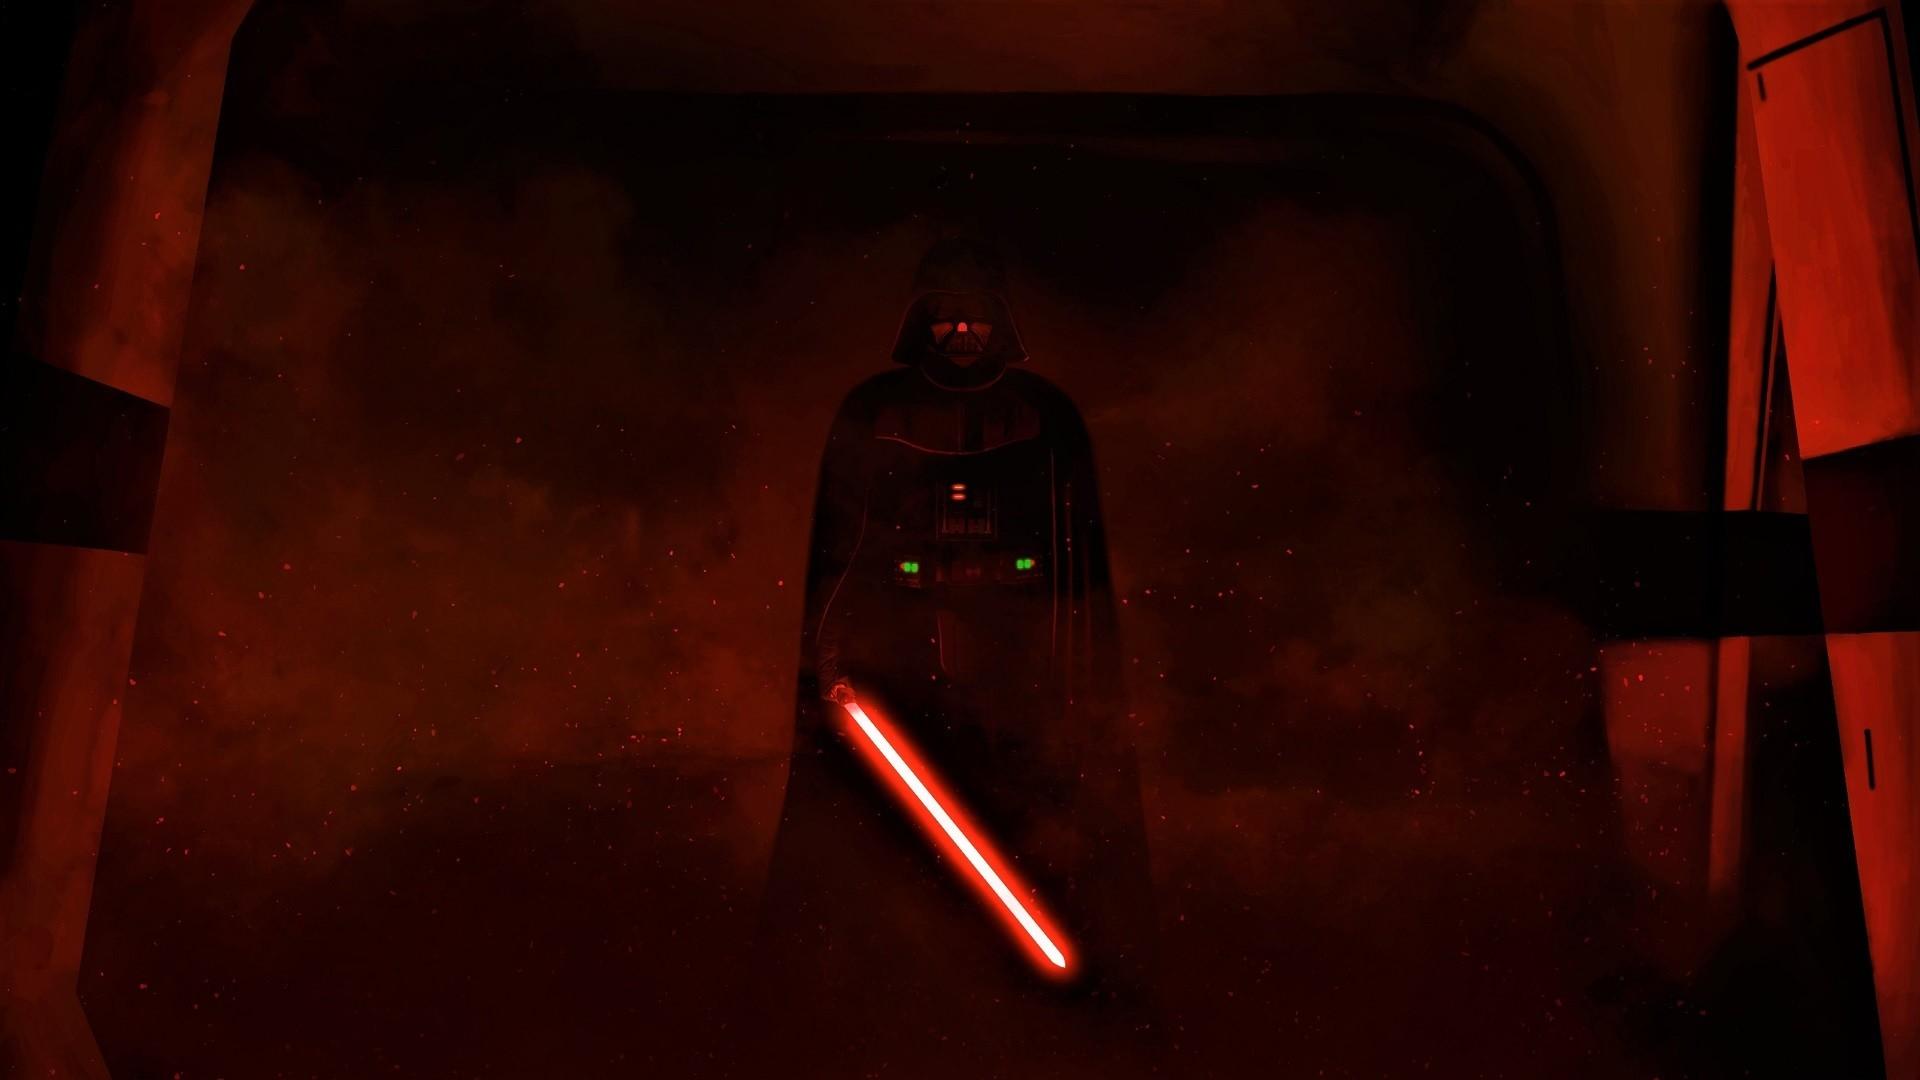 Star Wars Wallpaper Hd Star Wars Wallpaper Darth Vader 3114600 Hd Wallpaper Backgrounds Download